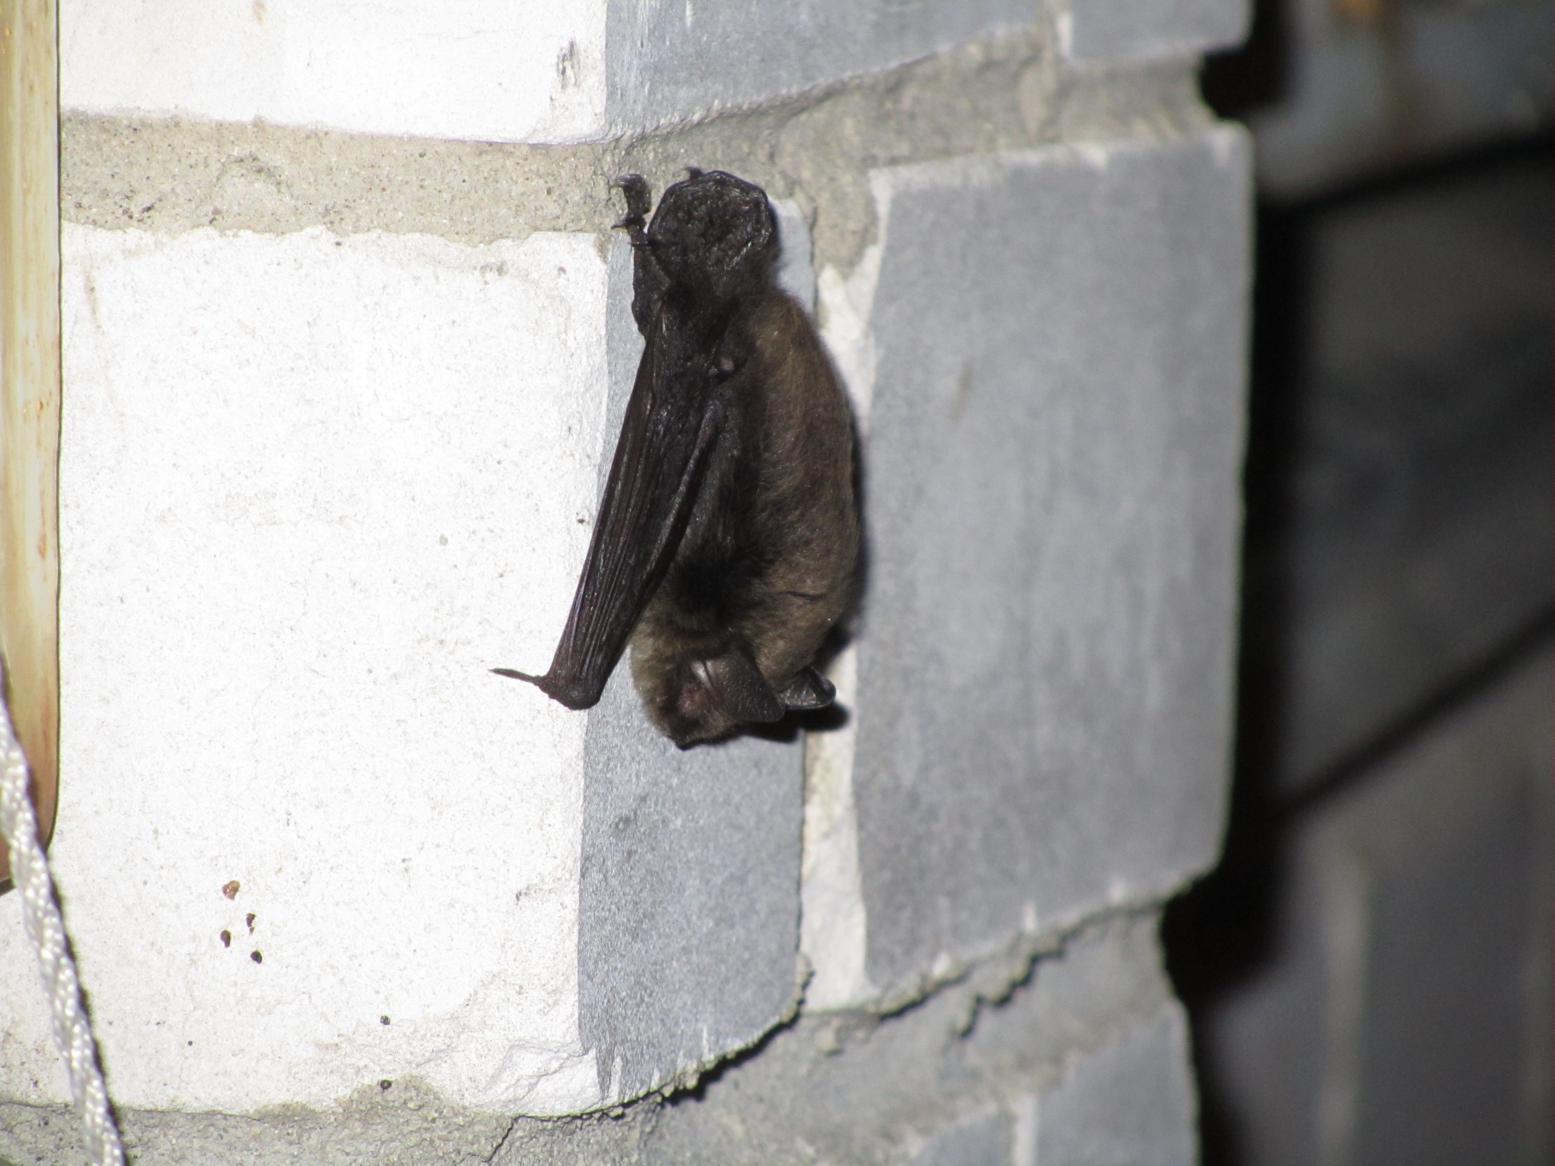 Фурри летучие мыши 13 фотография